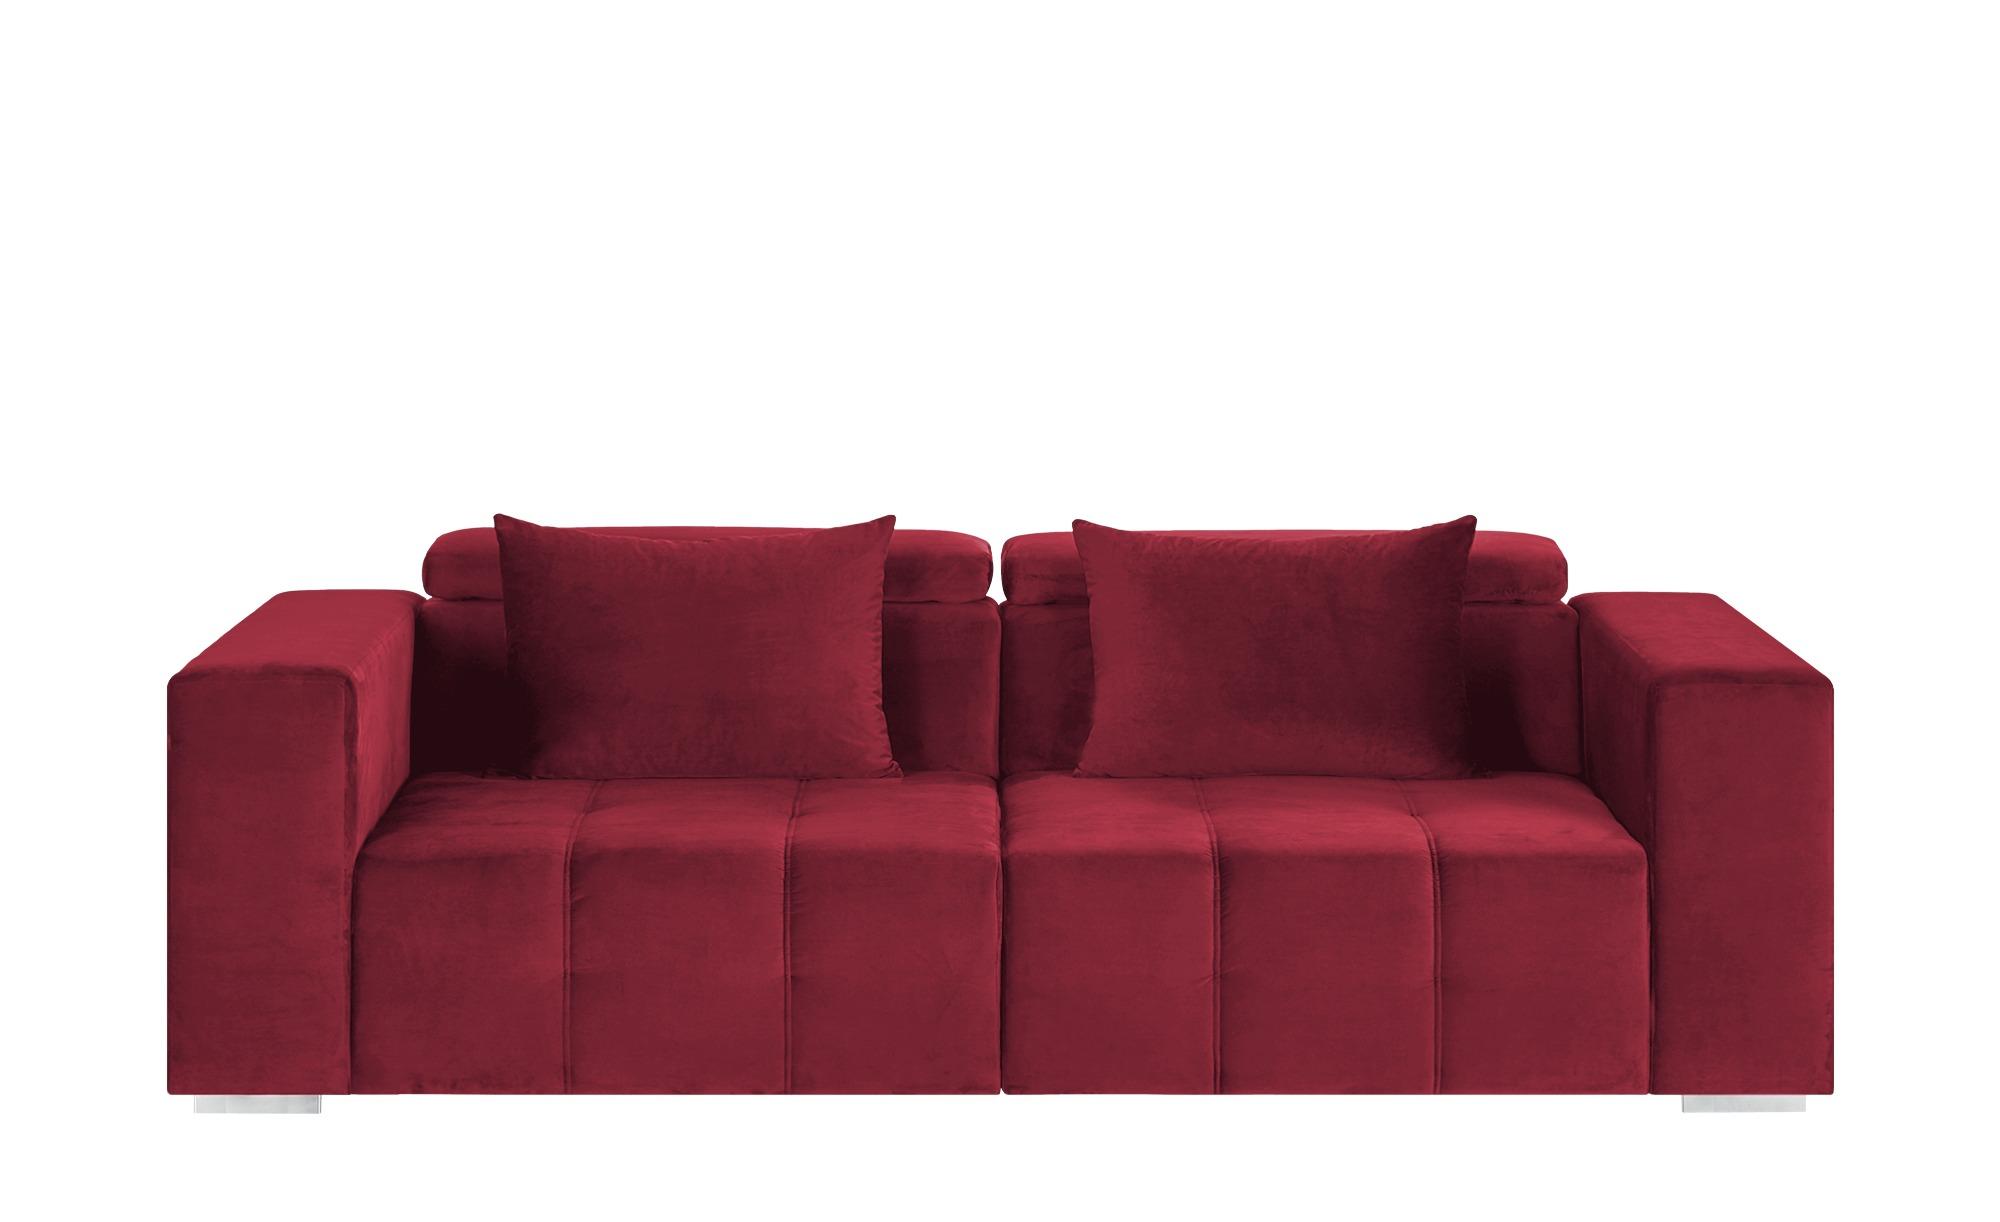 switch Big Sofa  Vila ¦ rot ¦ Maße (cm): B: 261 H: 79 T: 120 Polstermöbel > Sofas > Big-Sofas - Höffner